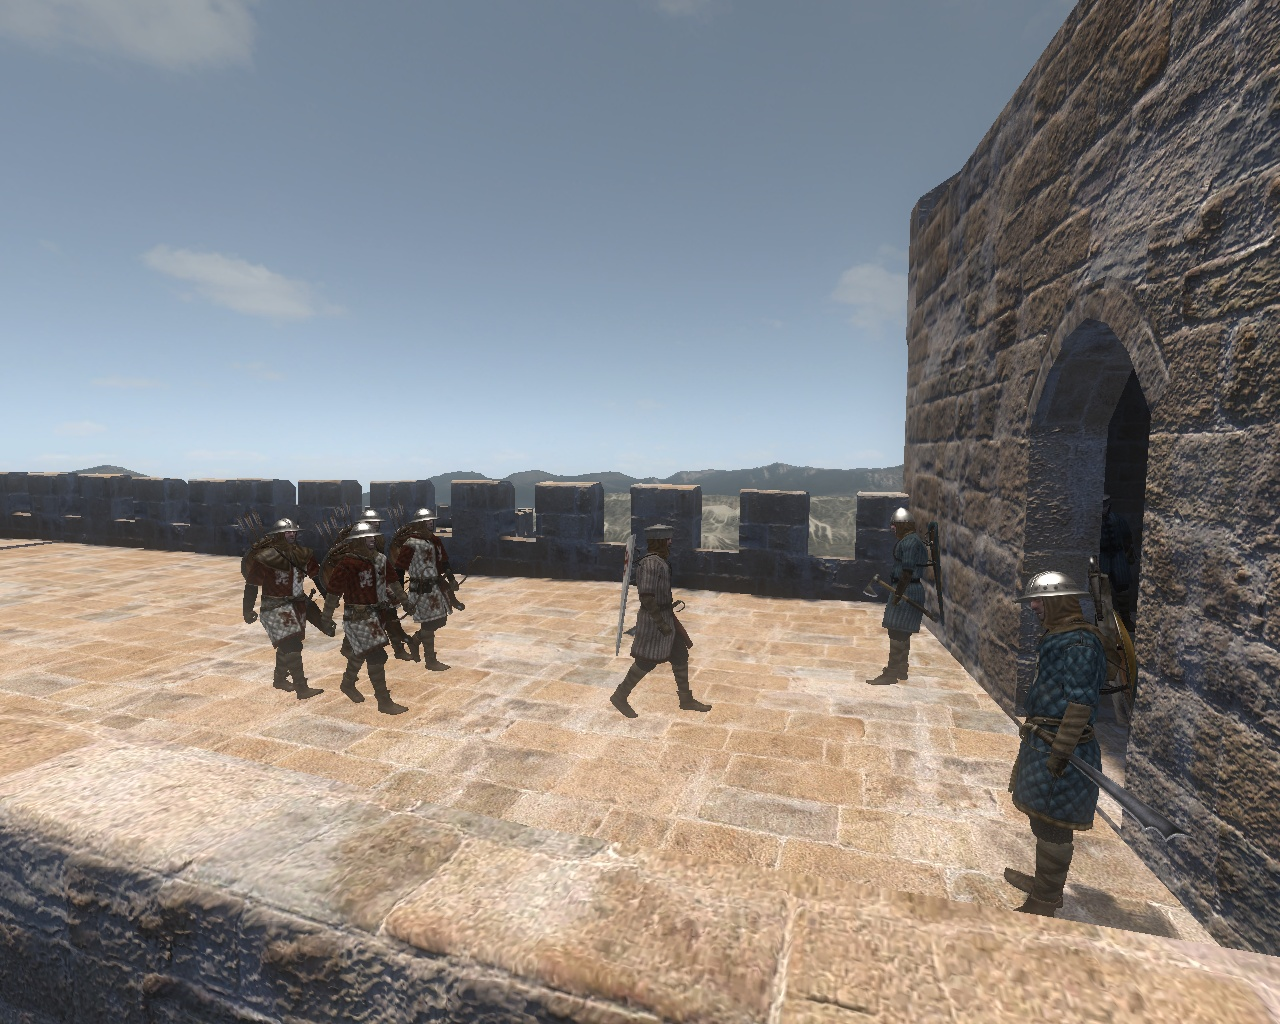 [A] Crusaders Way to Expiation (CANCELADO) - Página 3 3fd3f6be19bf